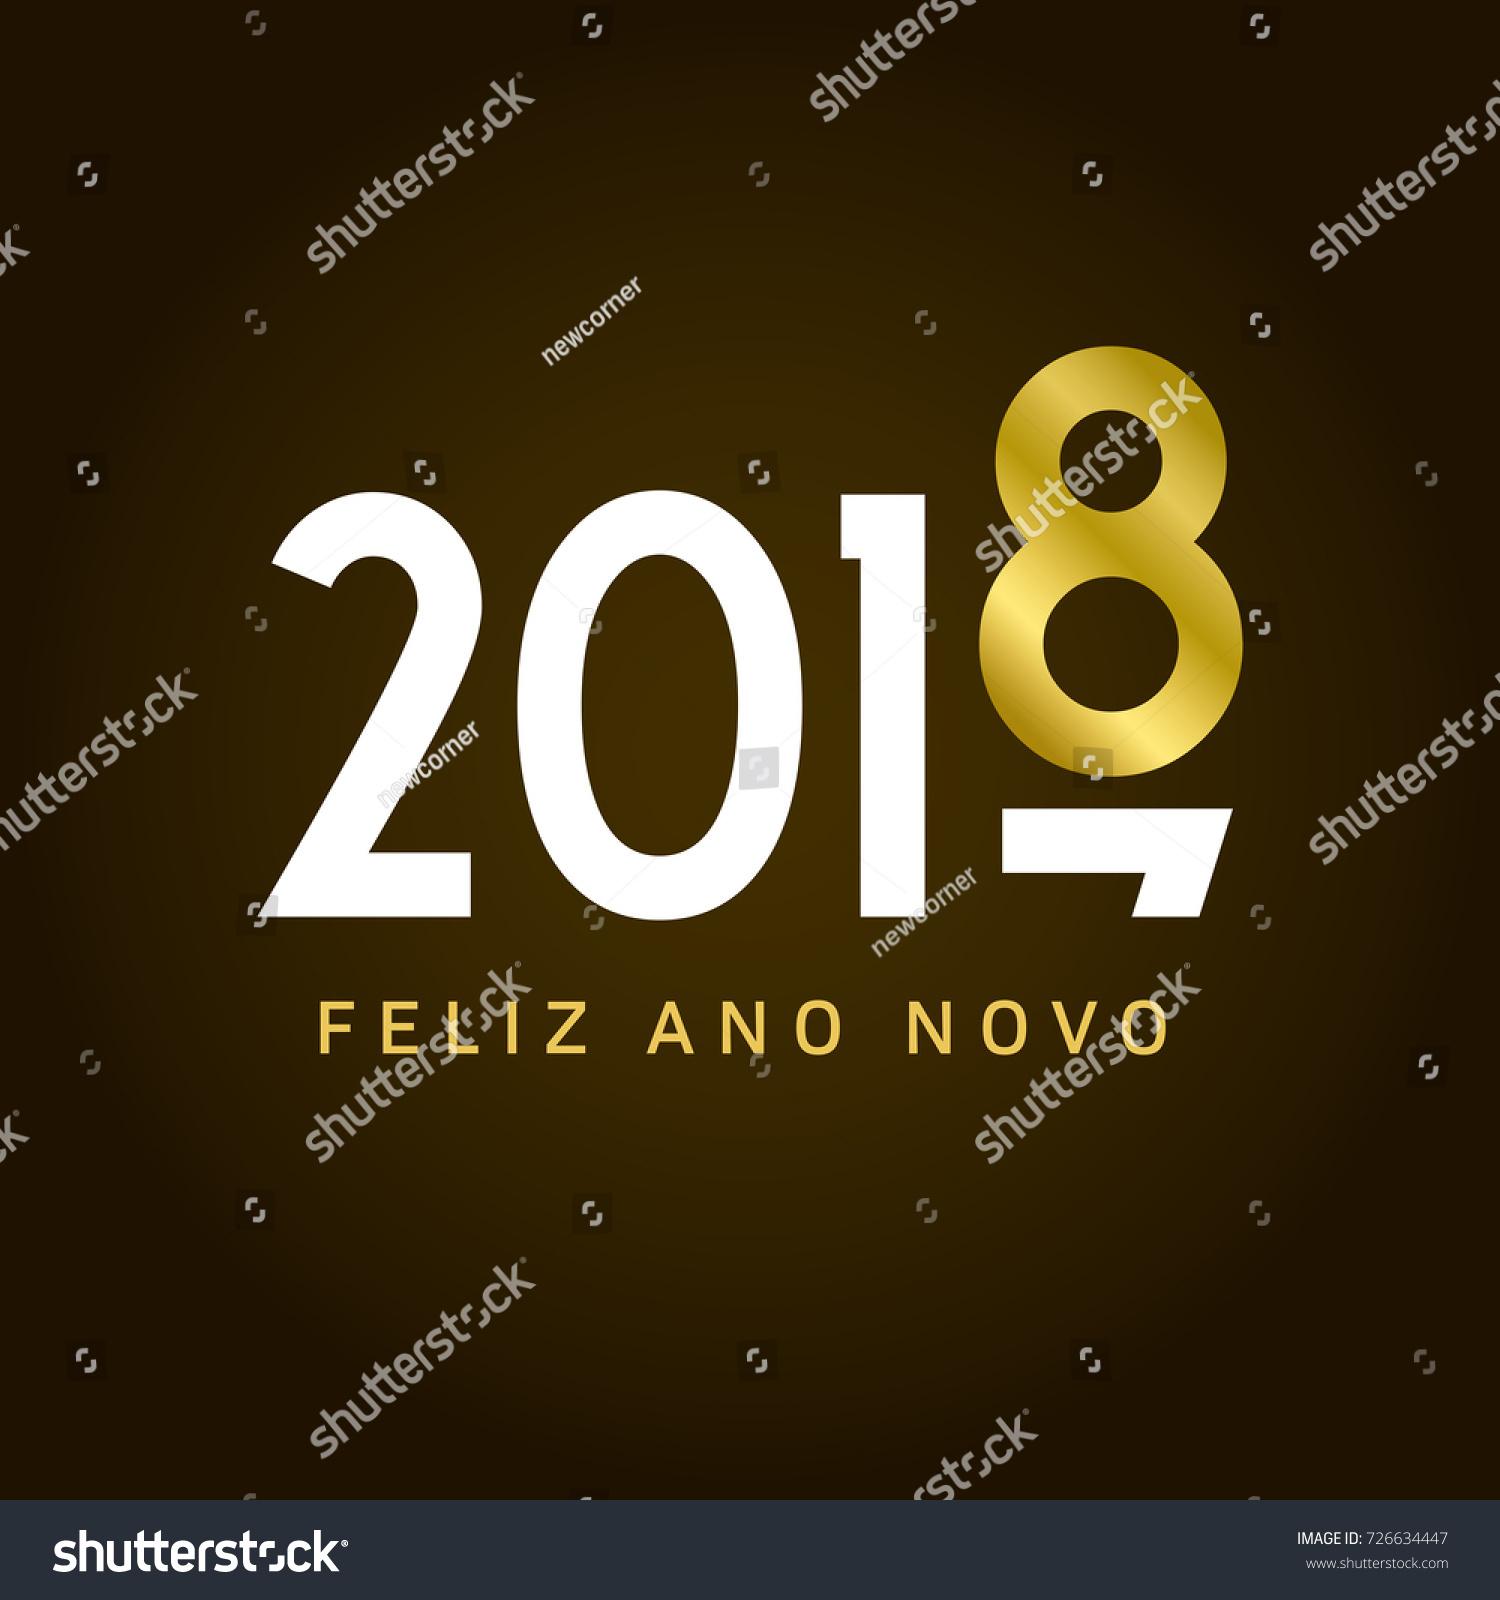 Happy new year 2018 card movement stock vector hd royalty free happy new year 2018 card movement type portuguese version editable vector design m4hsunfo